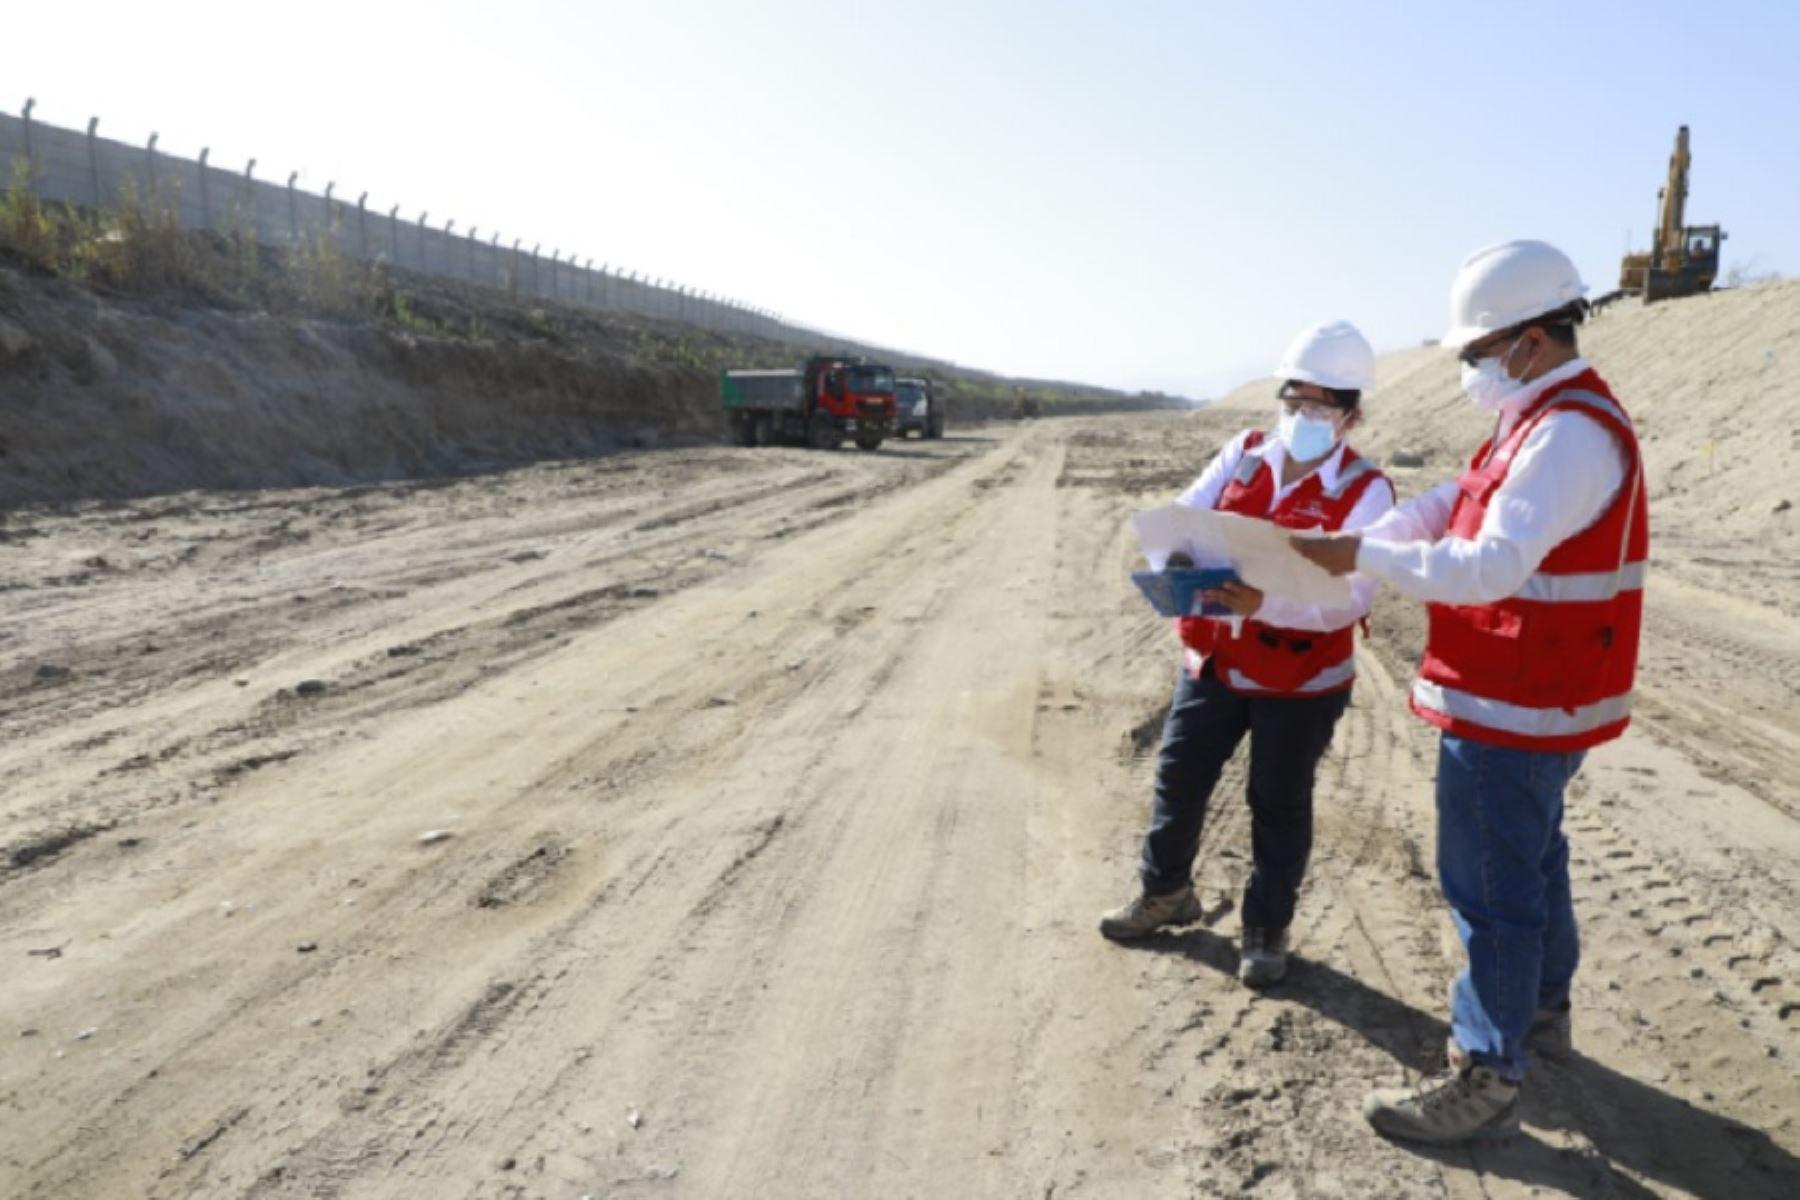 Contraloría aplicará control concurrente a obra que busca controlar desbordes del río Ica